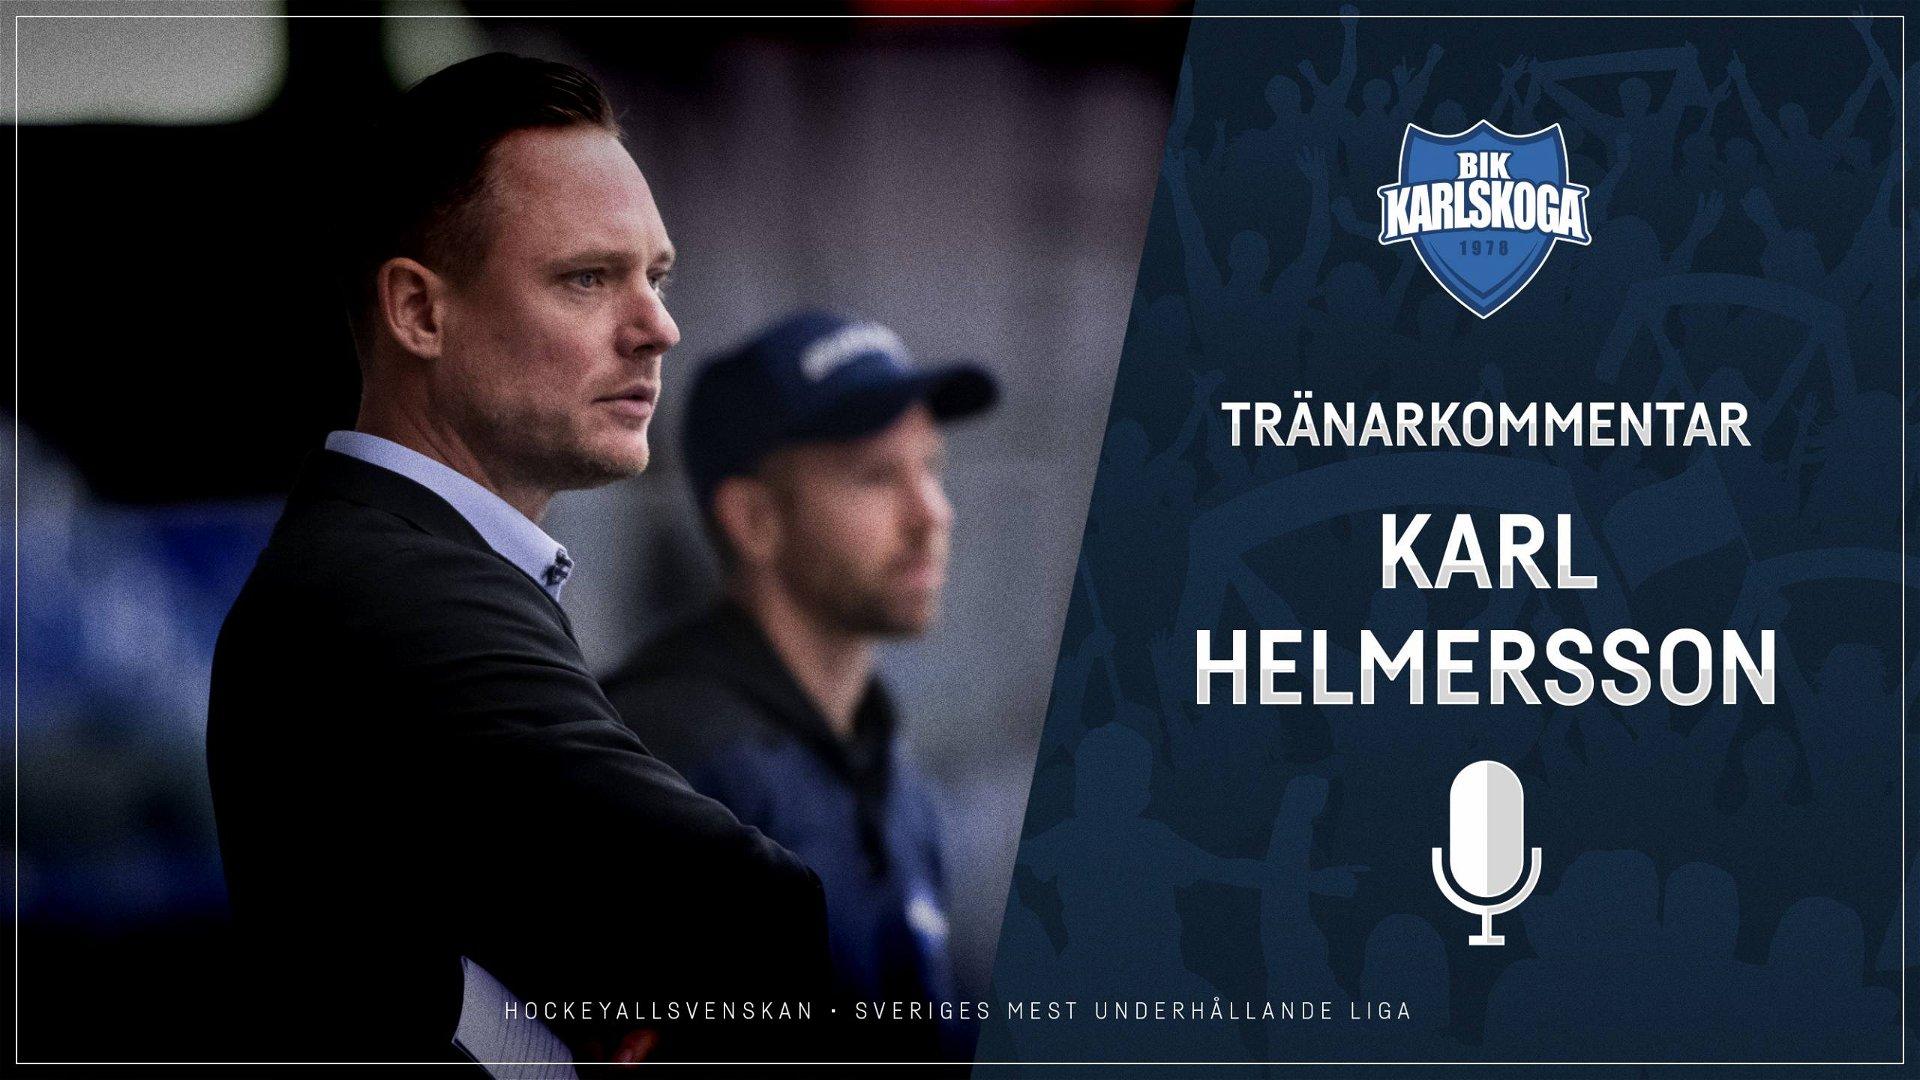 2021-01-15 Segerintervju: Karl Helmersson